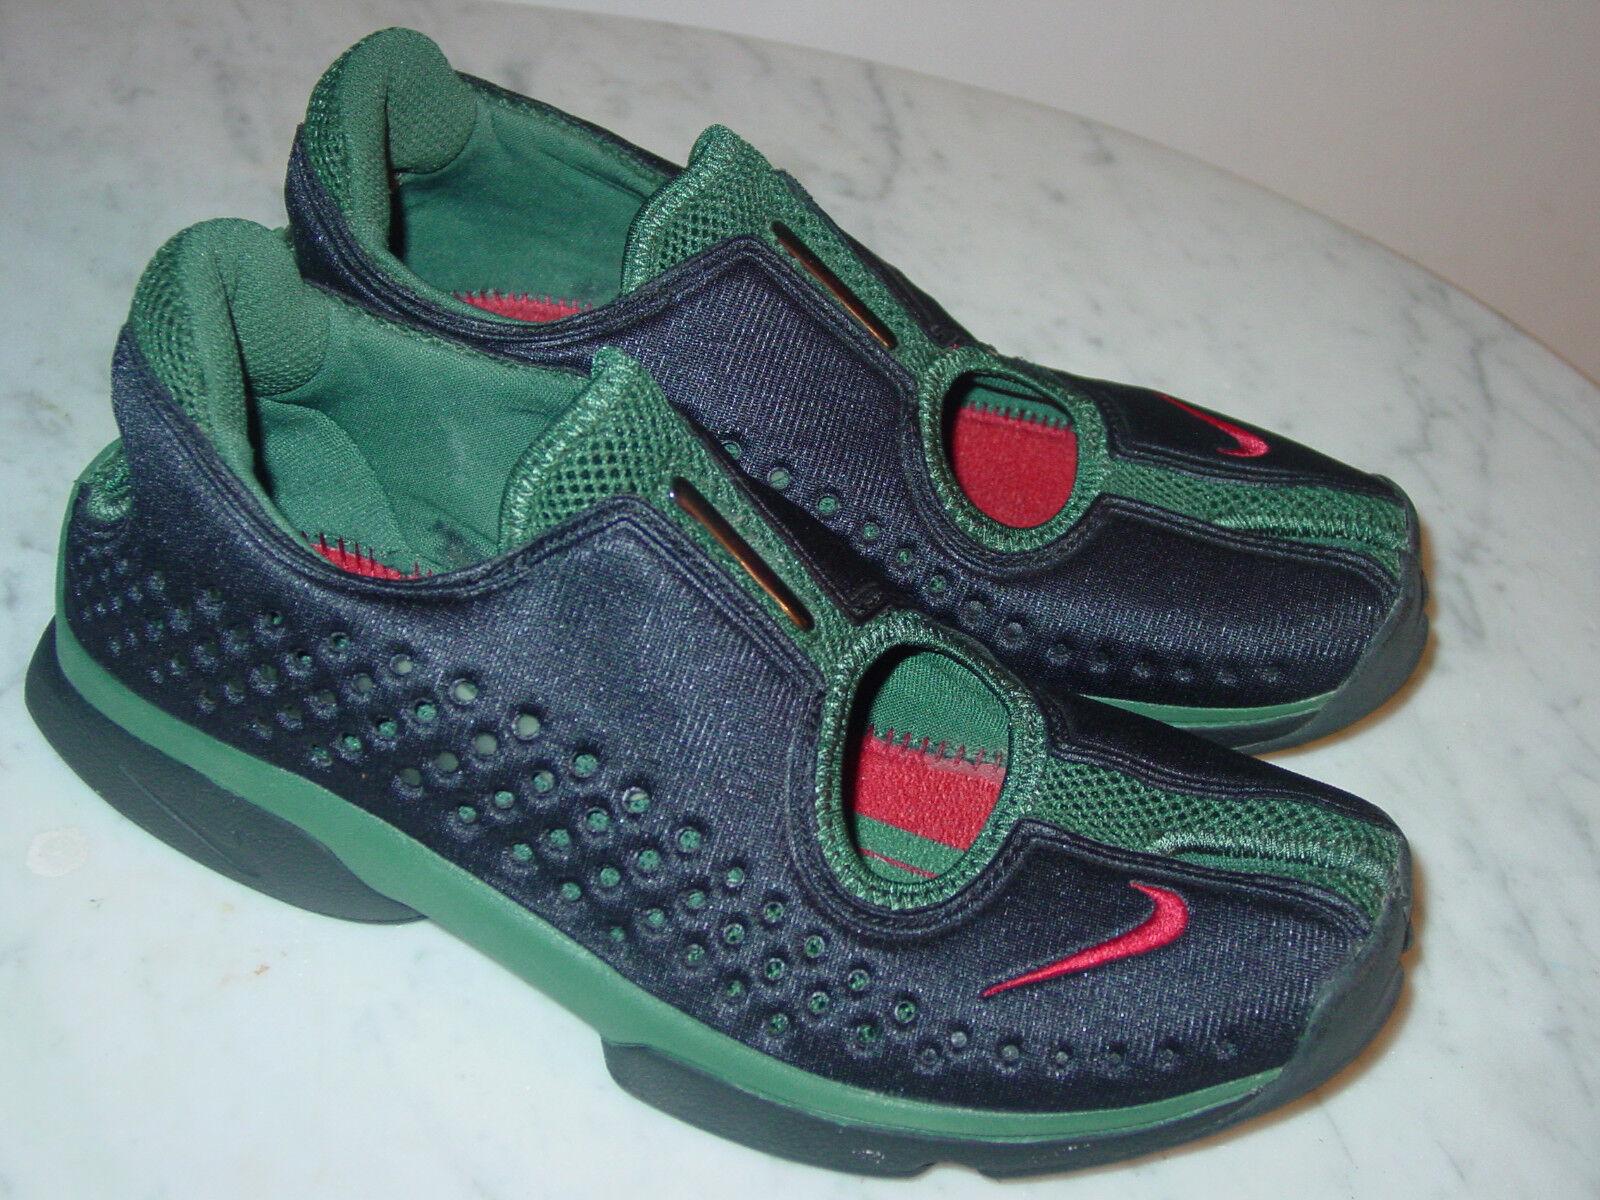 2002 Nike Rift Black Varsity Red Deep Forest Slip On shoes  Size 9